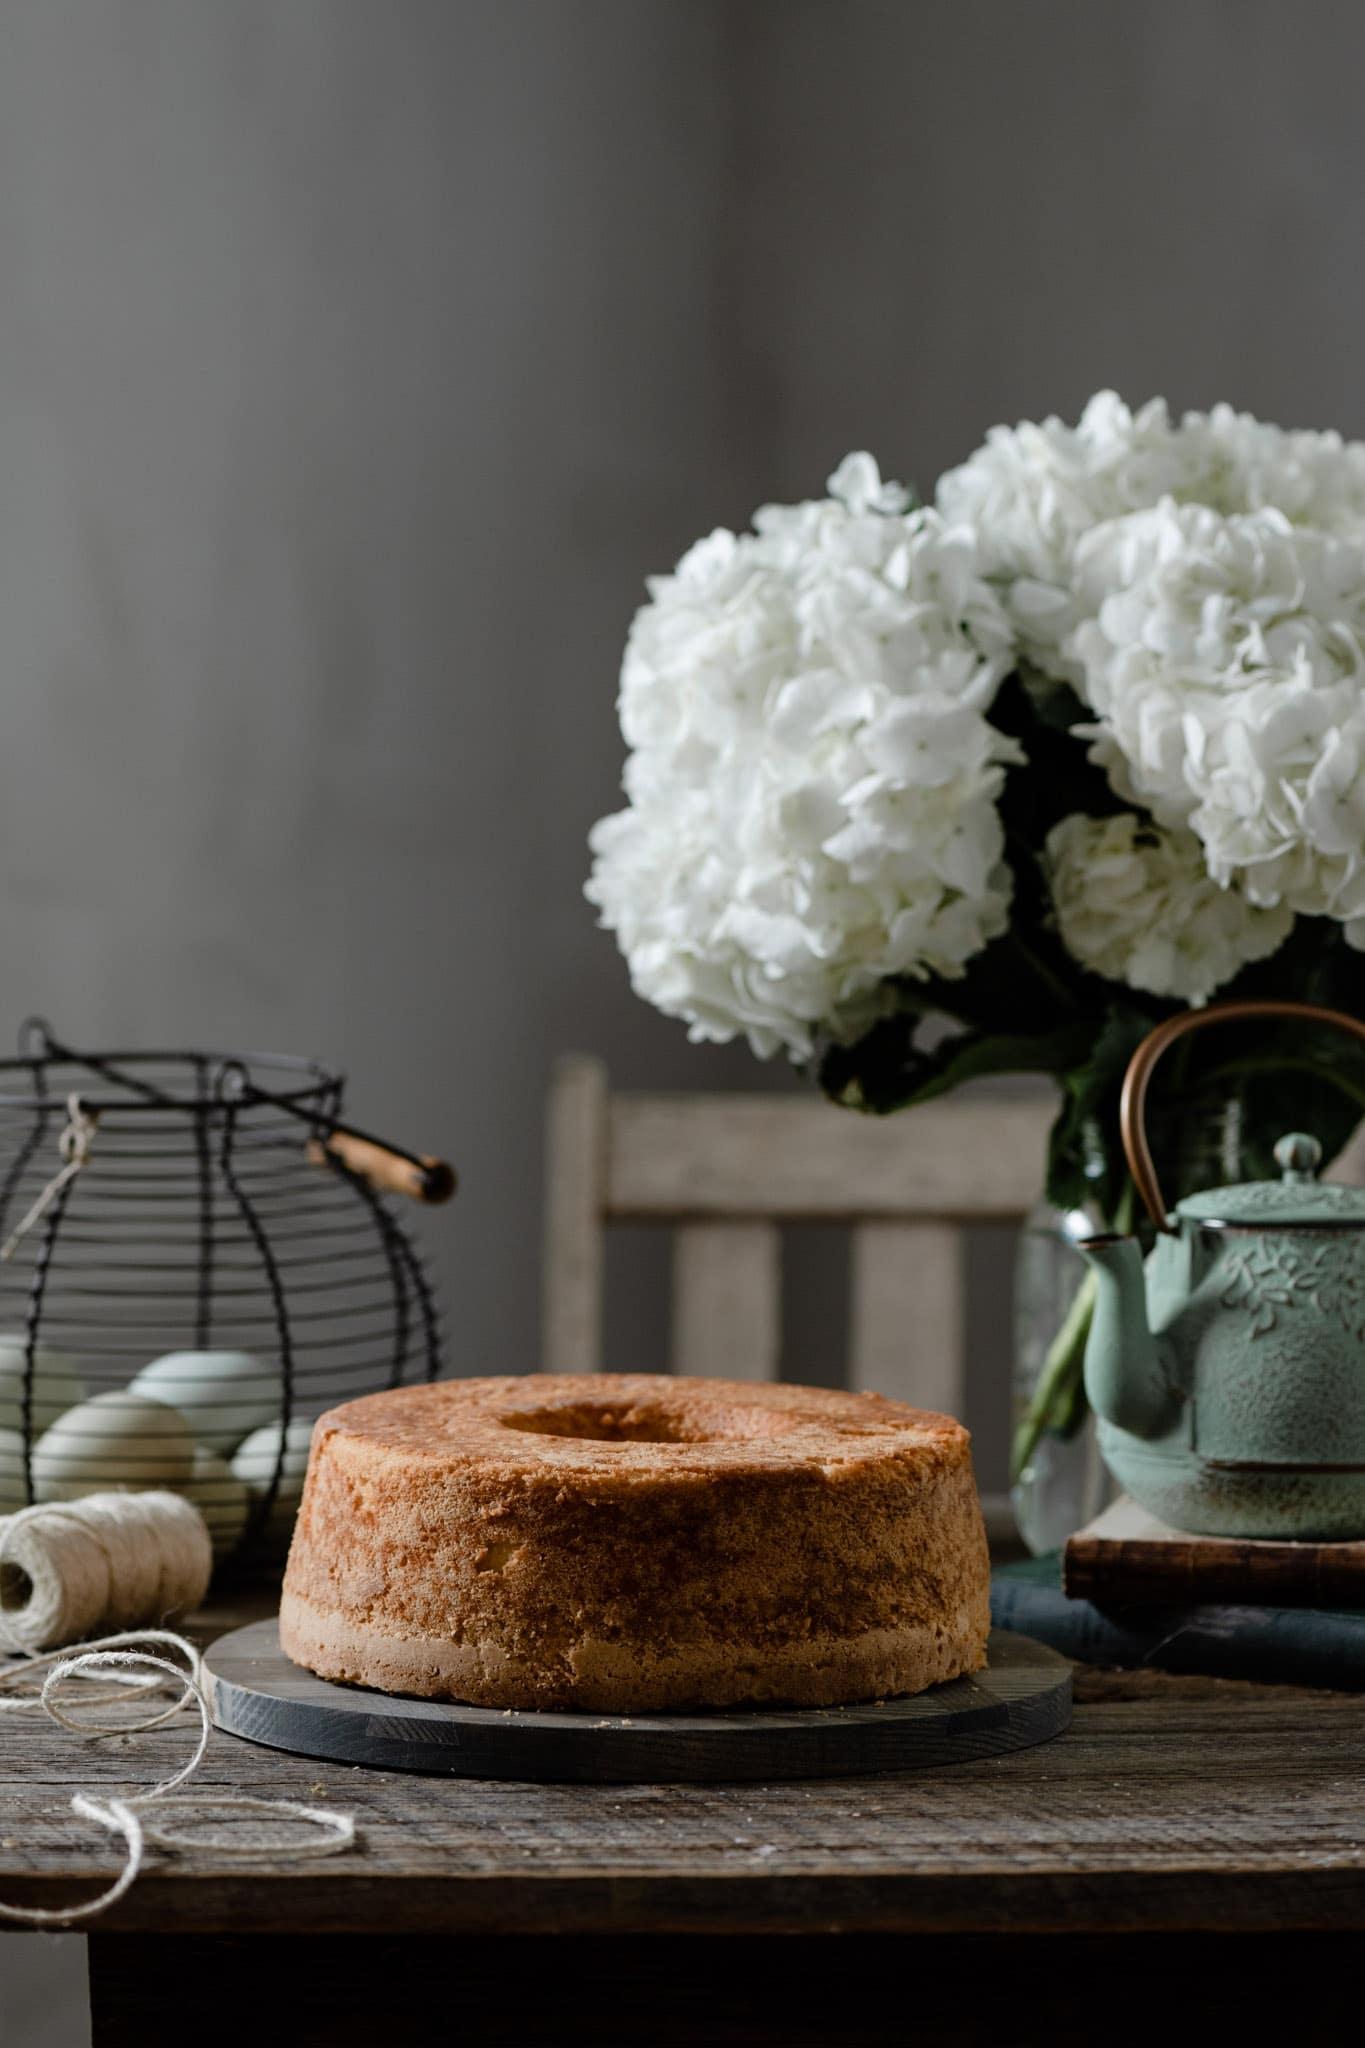 Traditional pound cake recipe on farmhouse table.